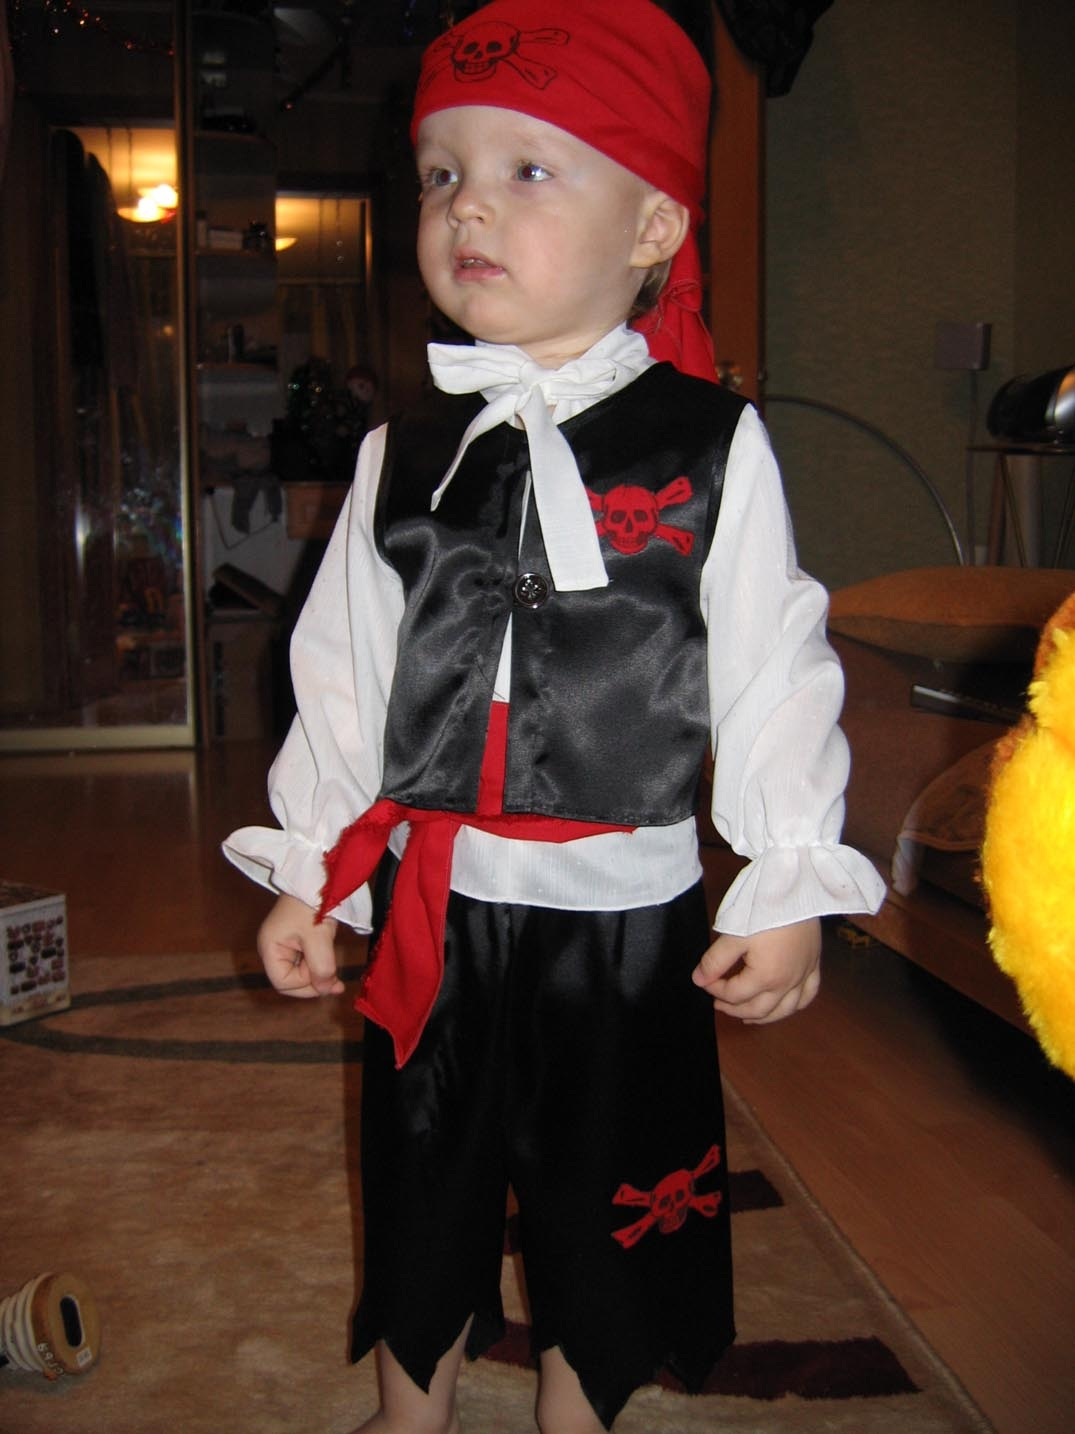 Фото новогодний костюм для мальчика своими руками фото быстро и красиво